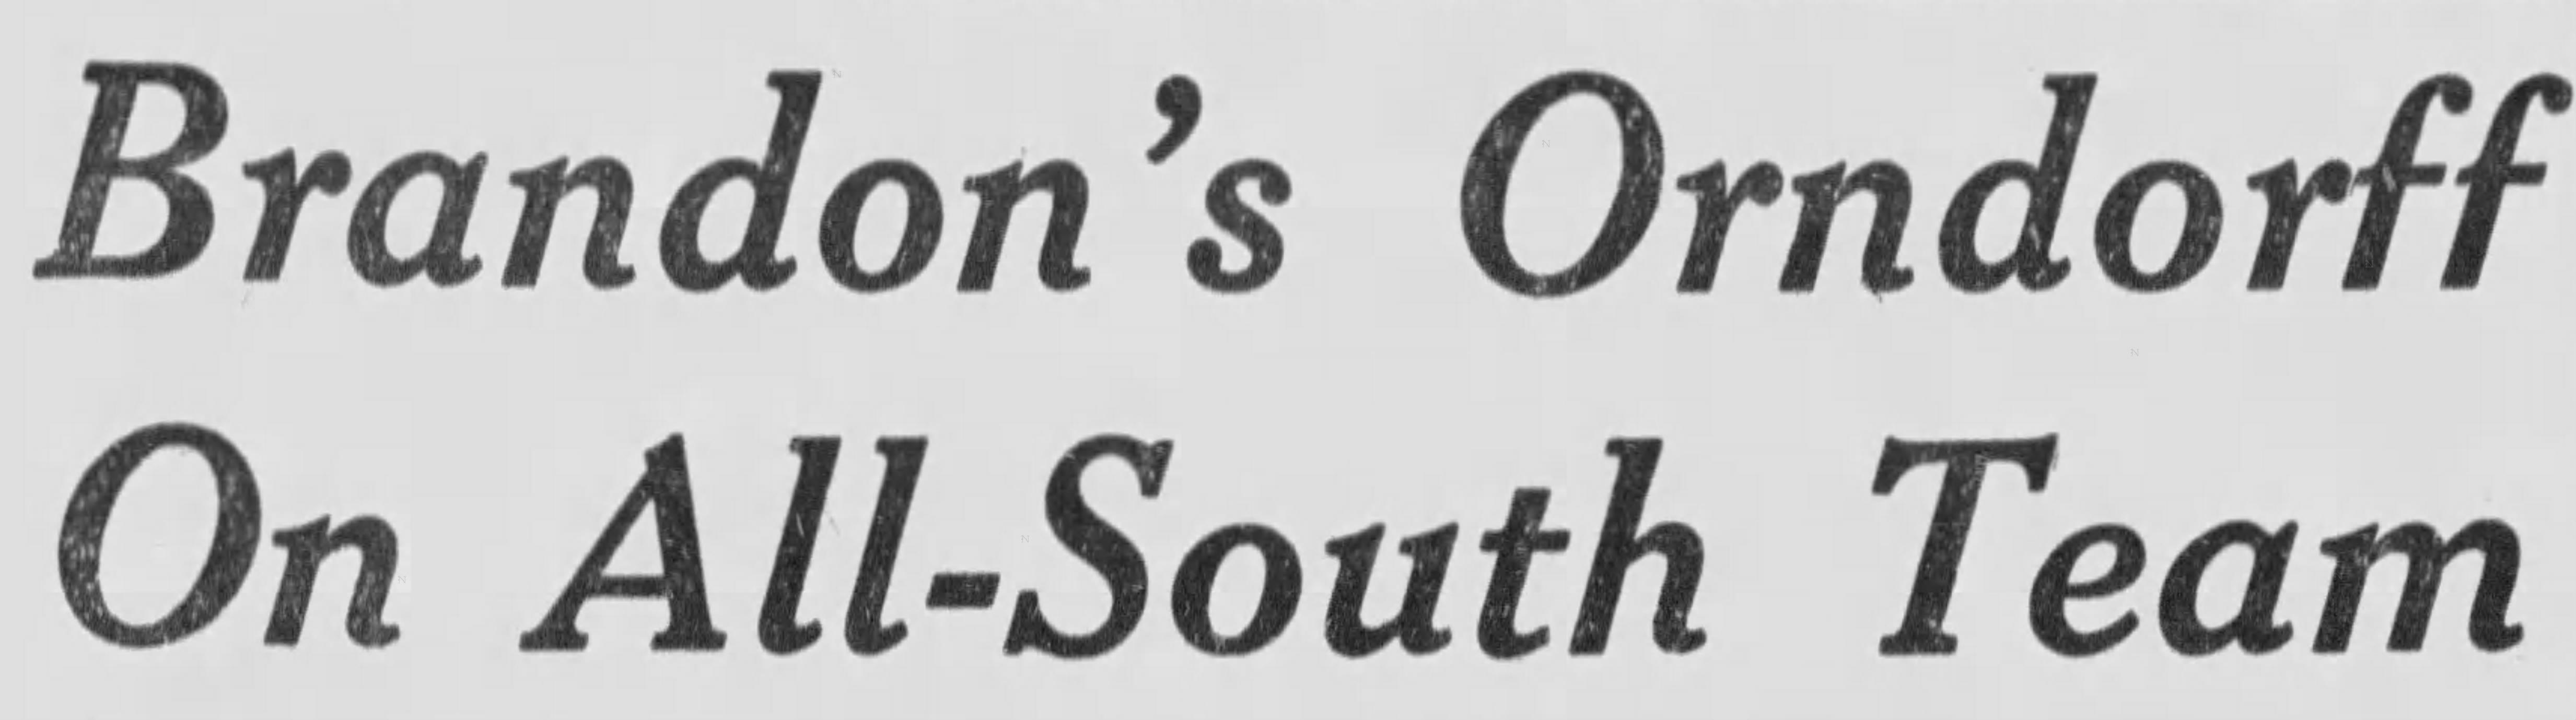 Newspaper headline when Paul Orndorff made Brandon, Florida's All-South Team for football